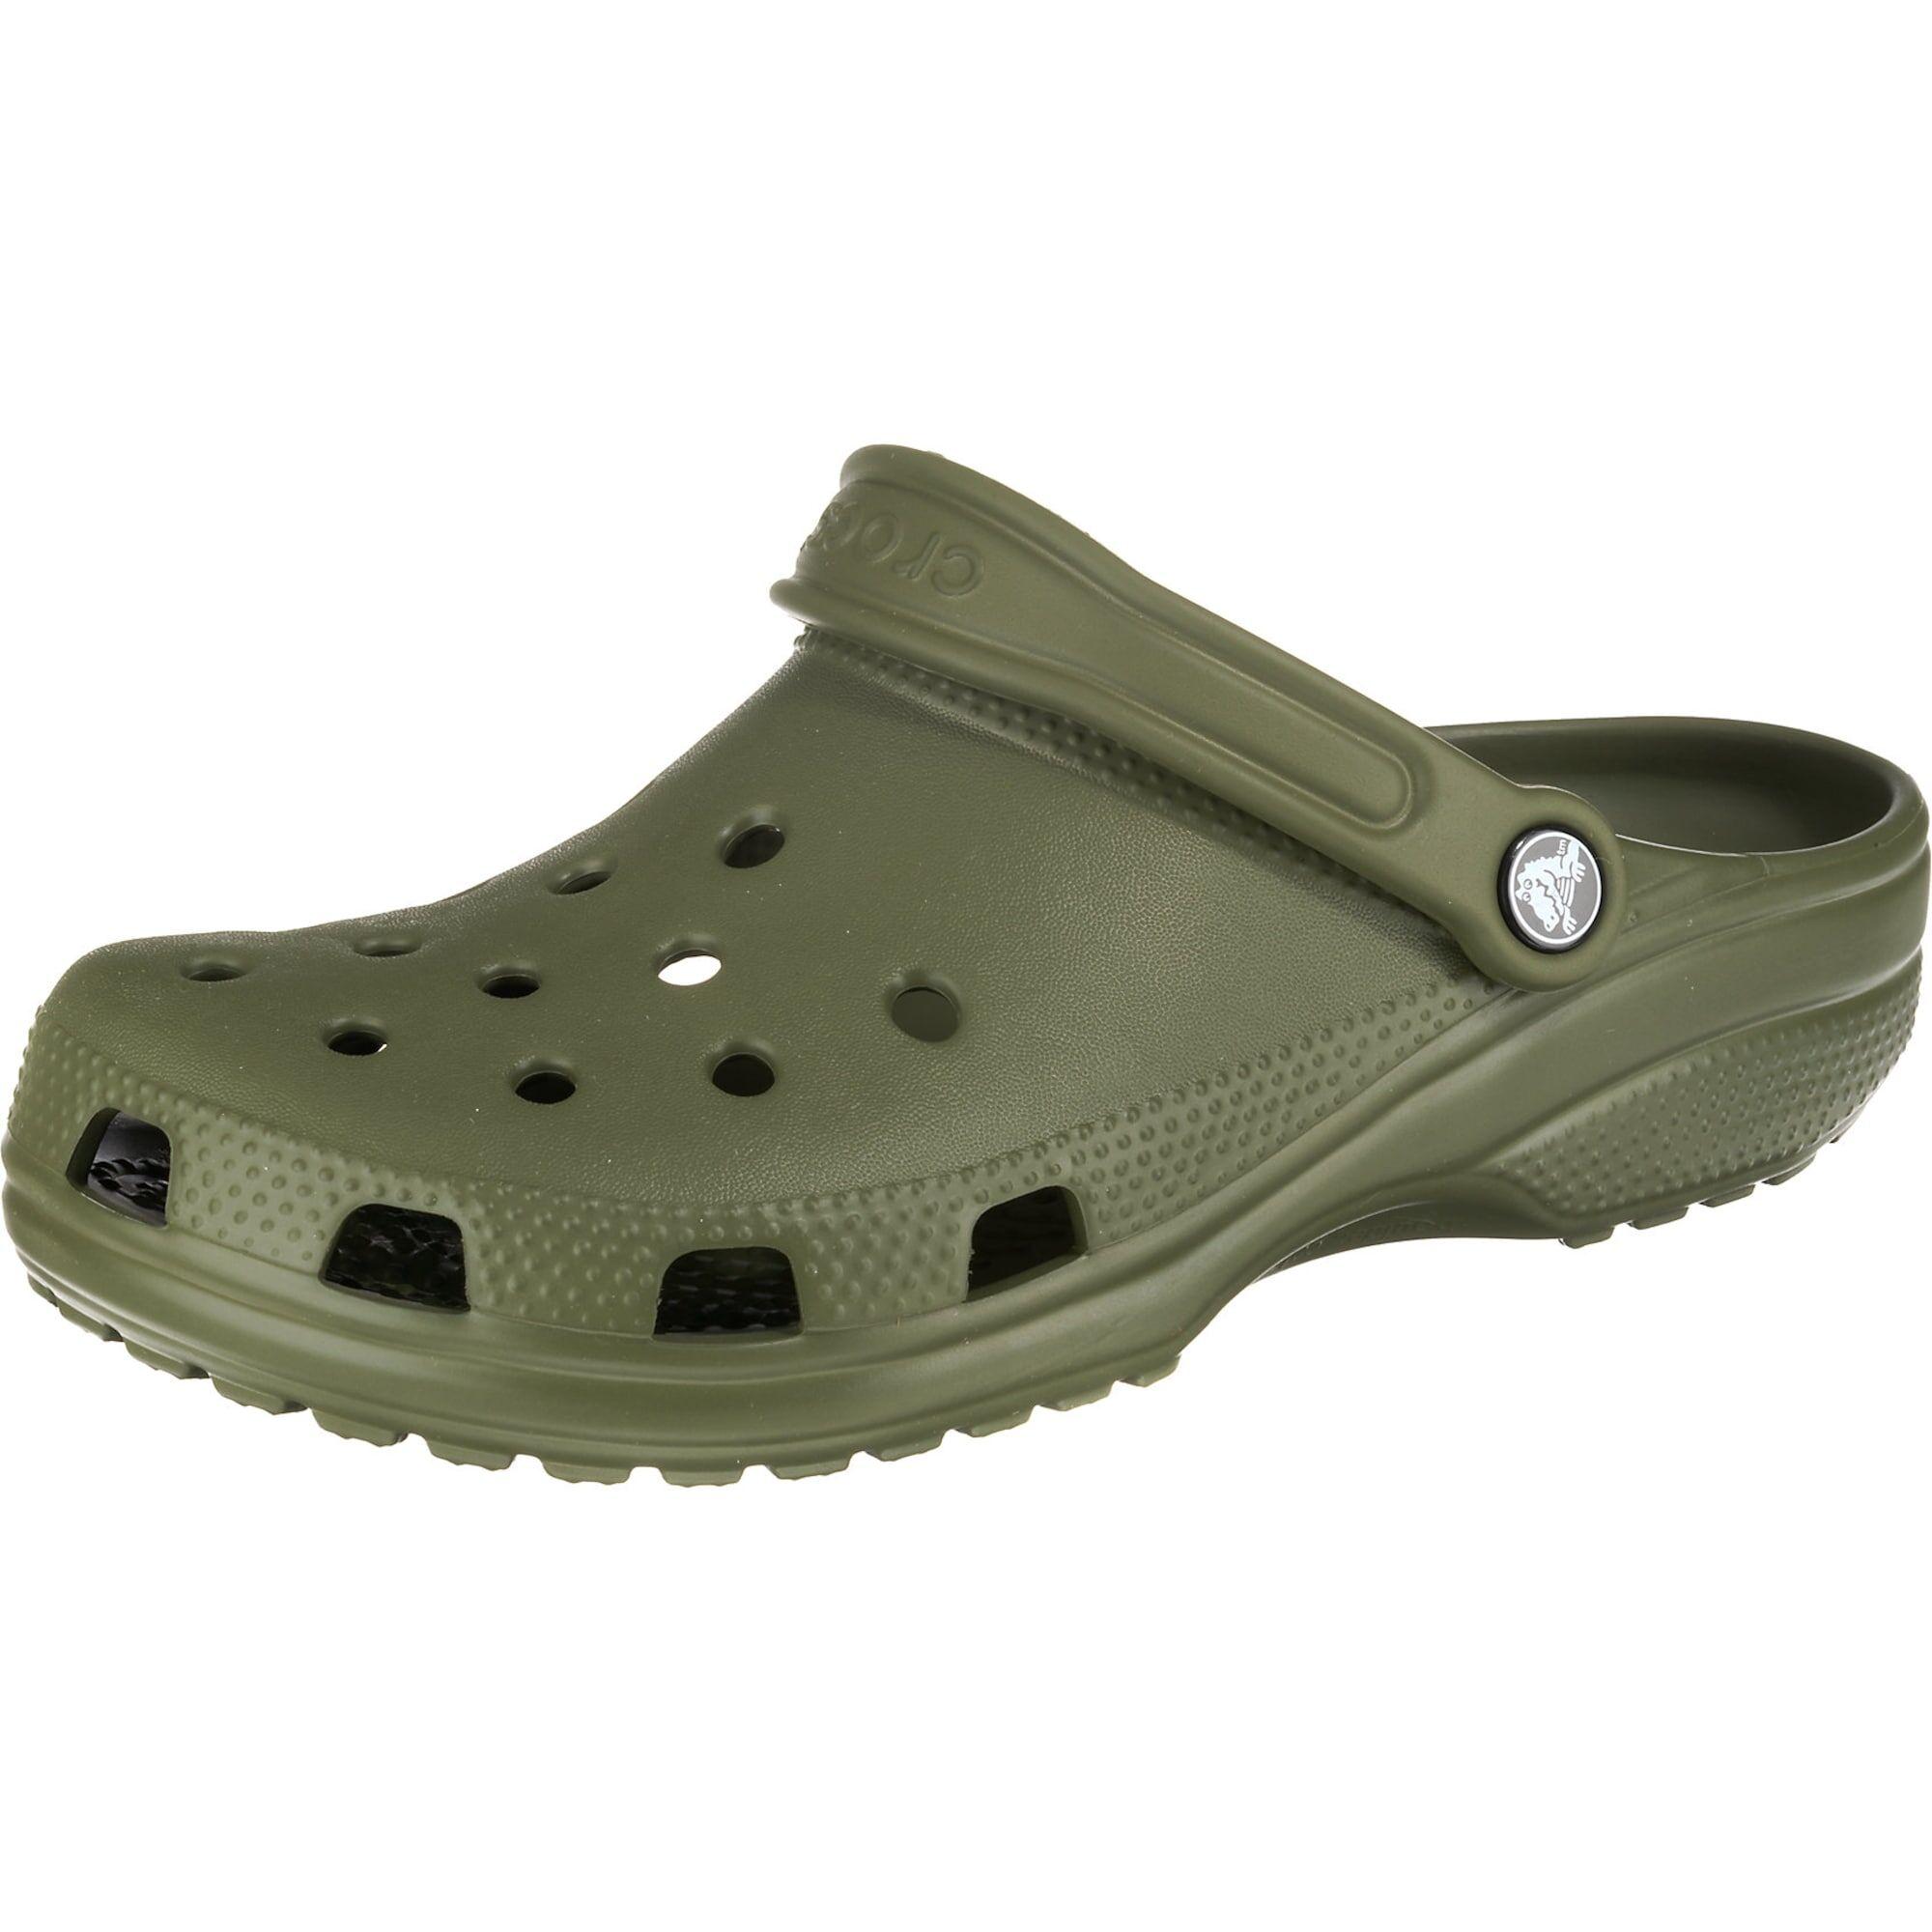 Crocs Sabots  - Vert - Taille: 38.5 - male